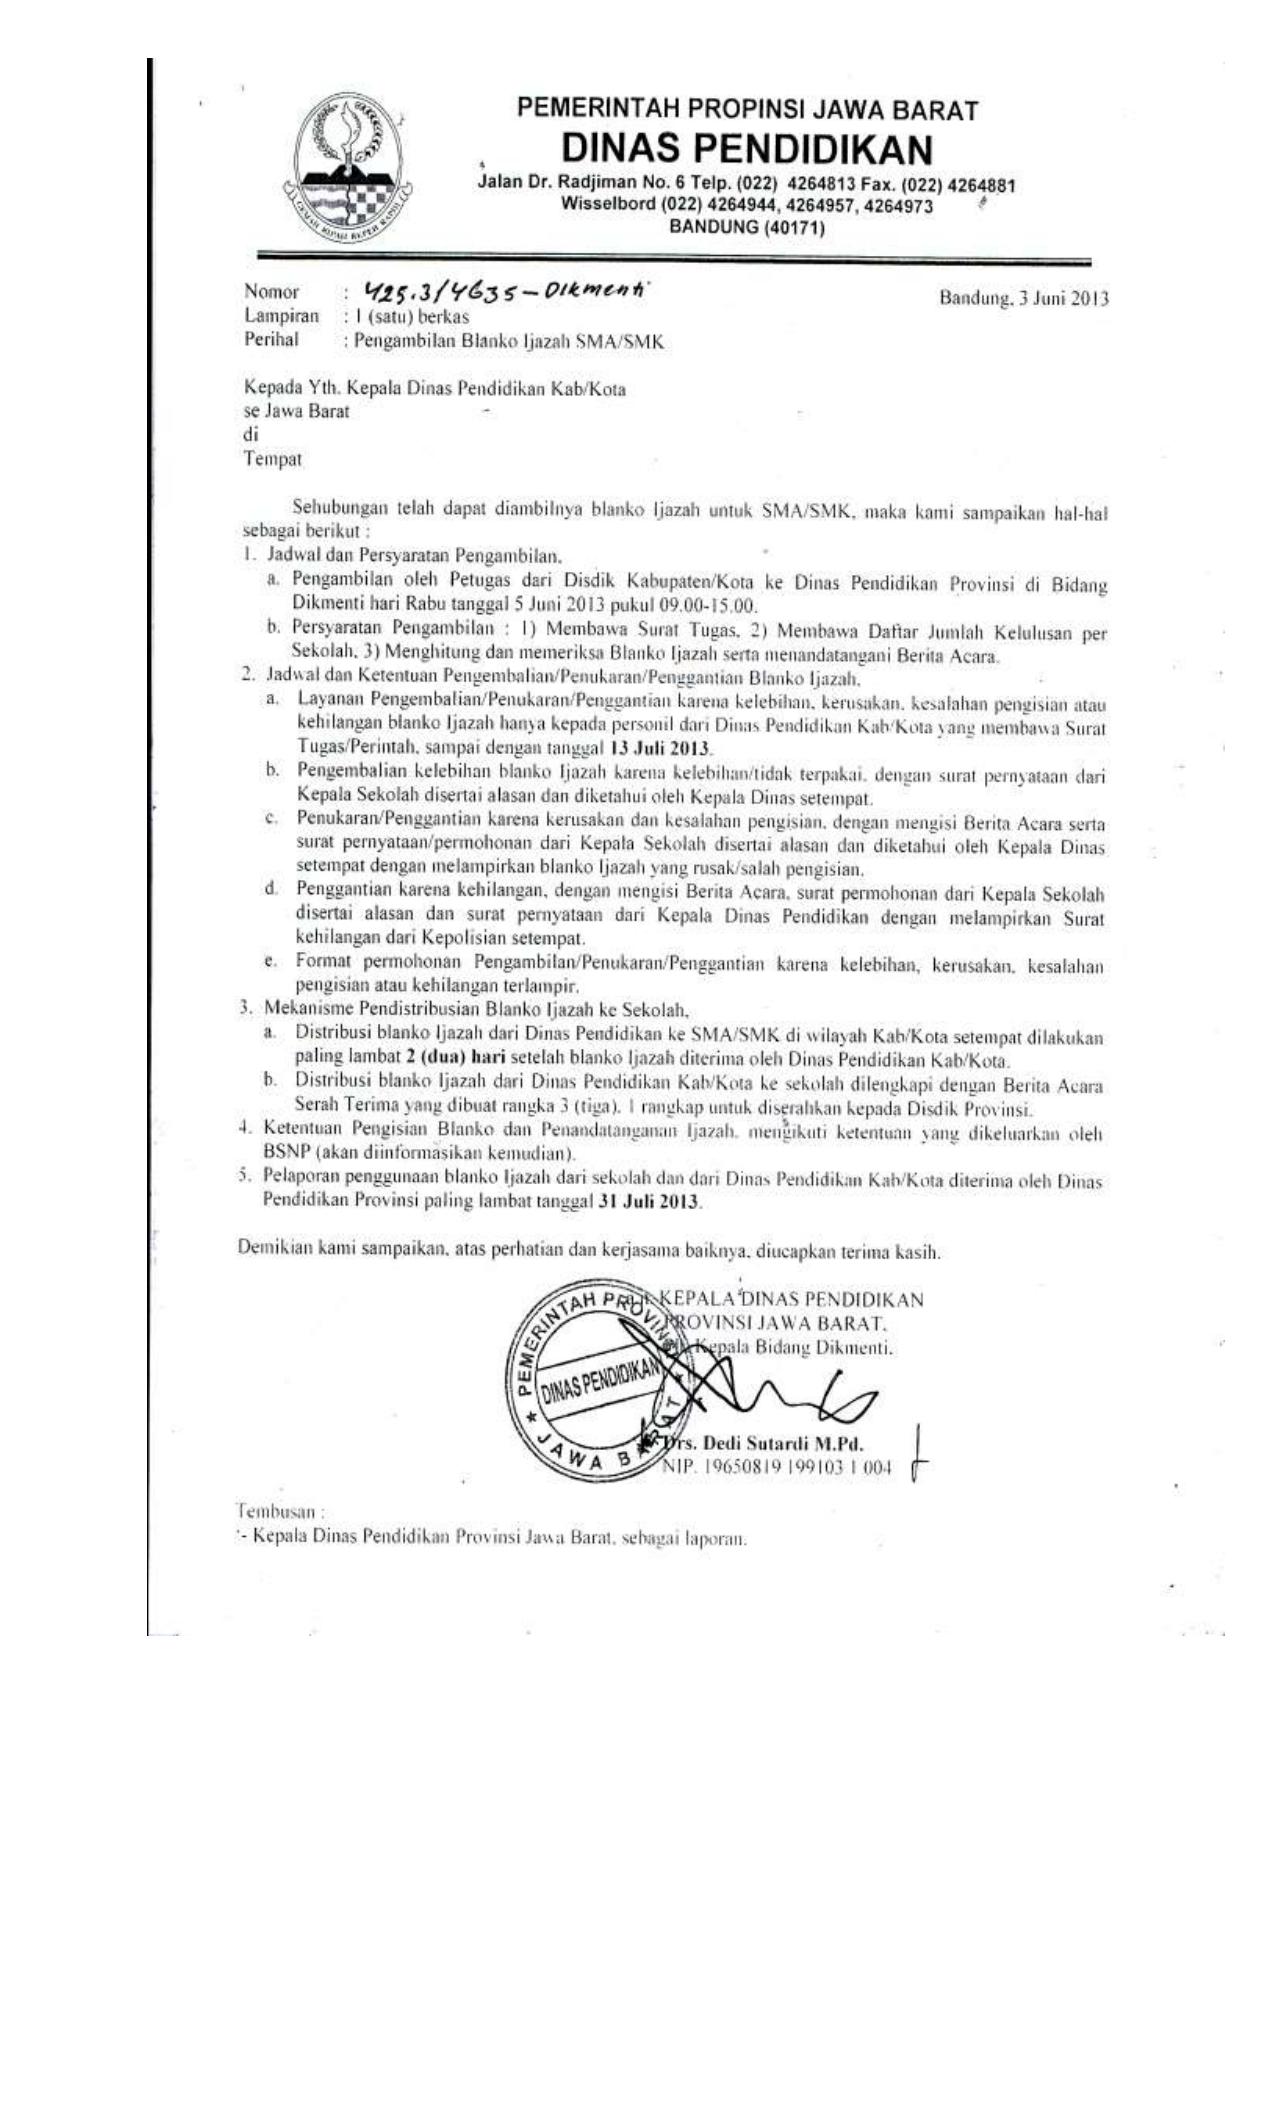 Dinas Pendidikan Kabupaten Cirebon